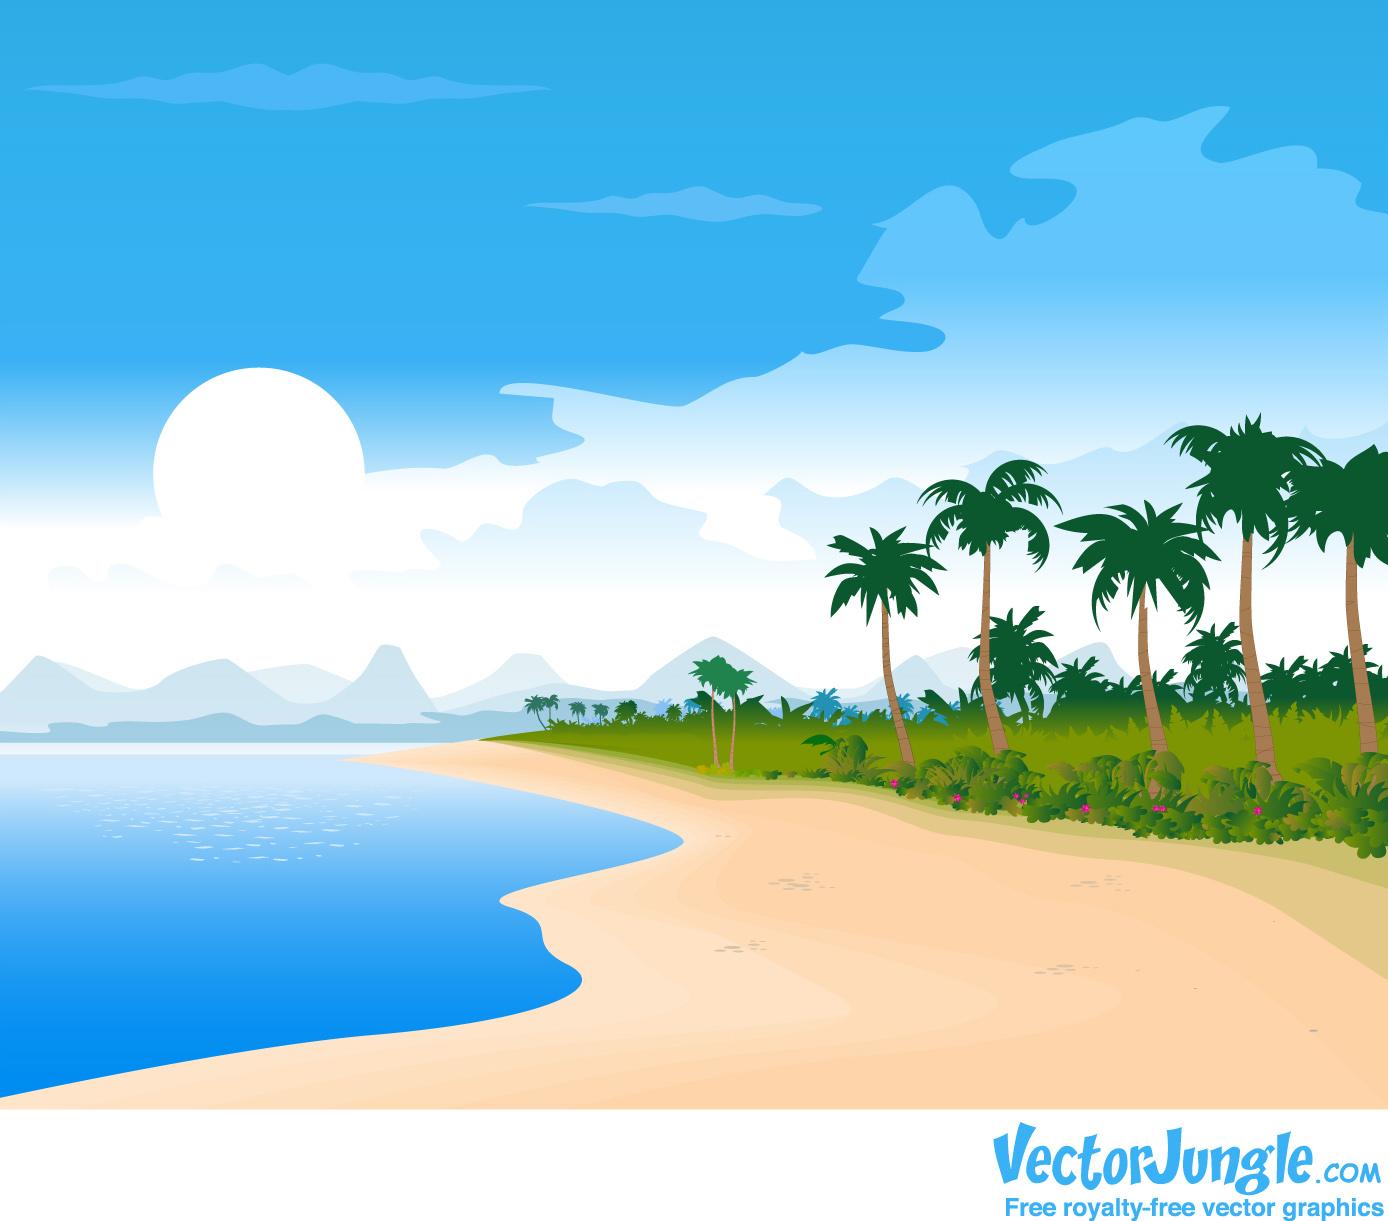 FREE VECTOR BEACH BACKGROUND VectorJungle   Vector Art Vector 1388x1221